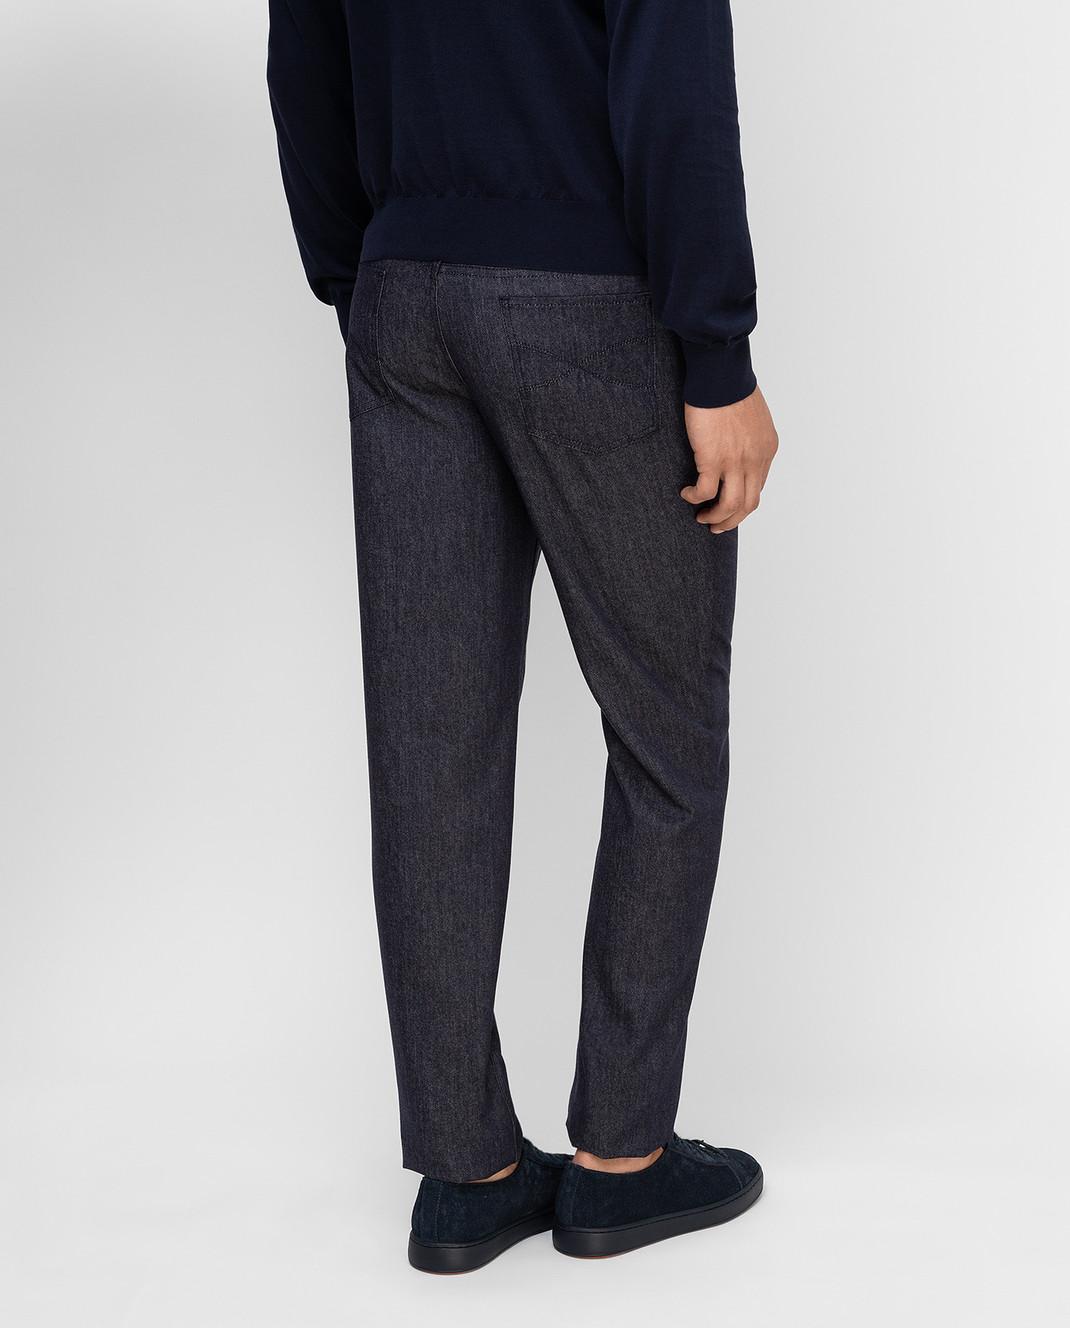 Brunello Cucinelli Темно-синие брюки из шерсти изображение 4